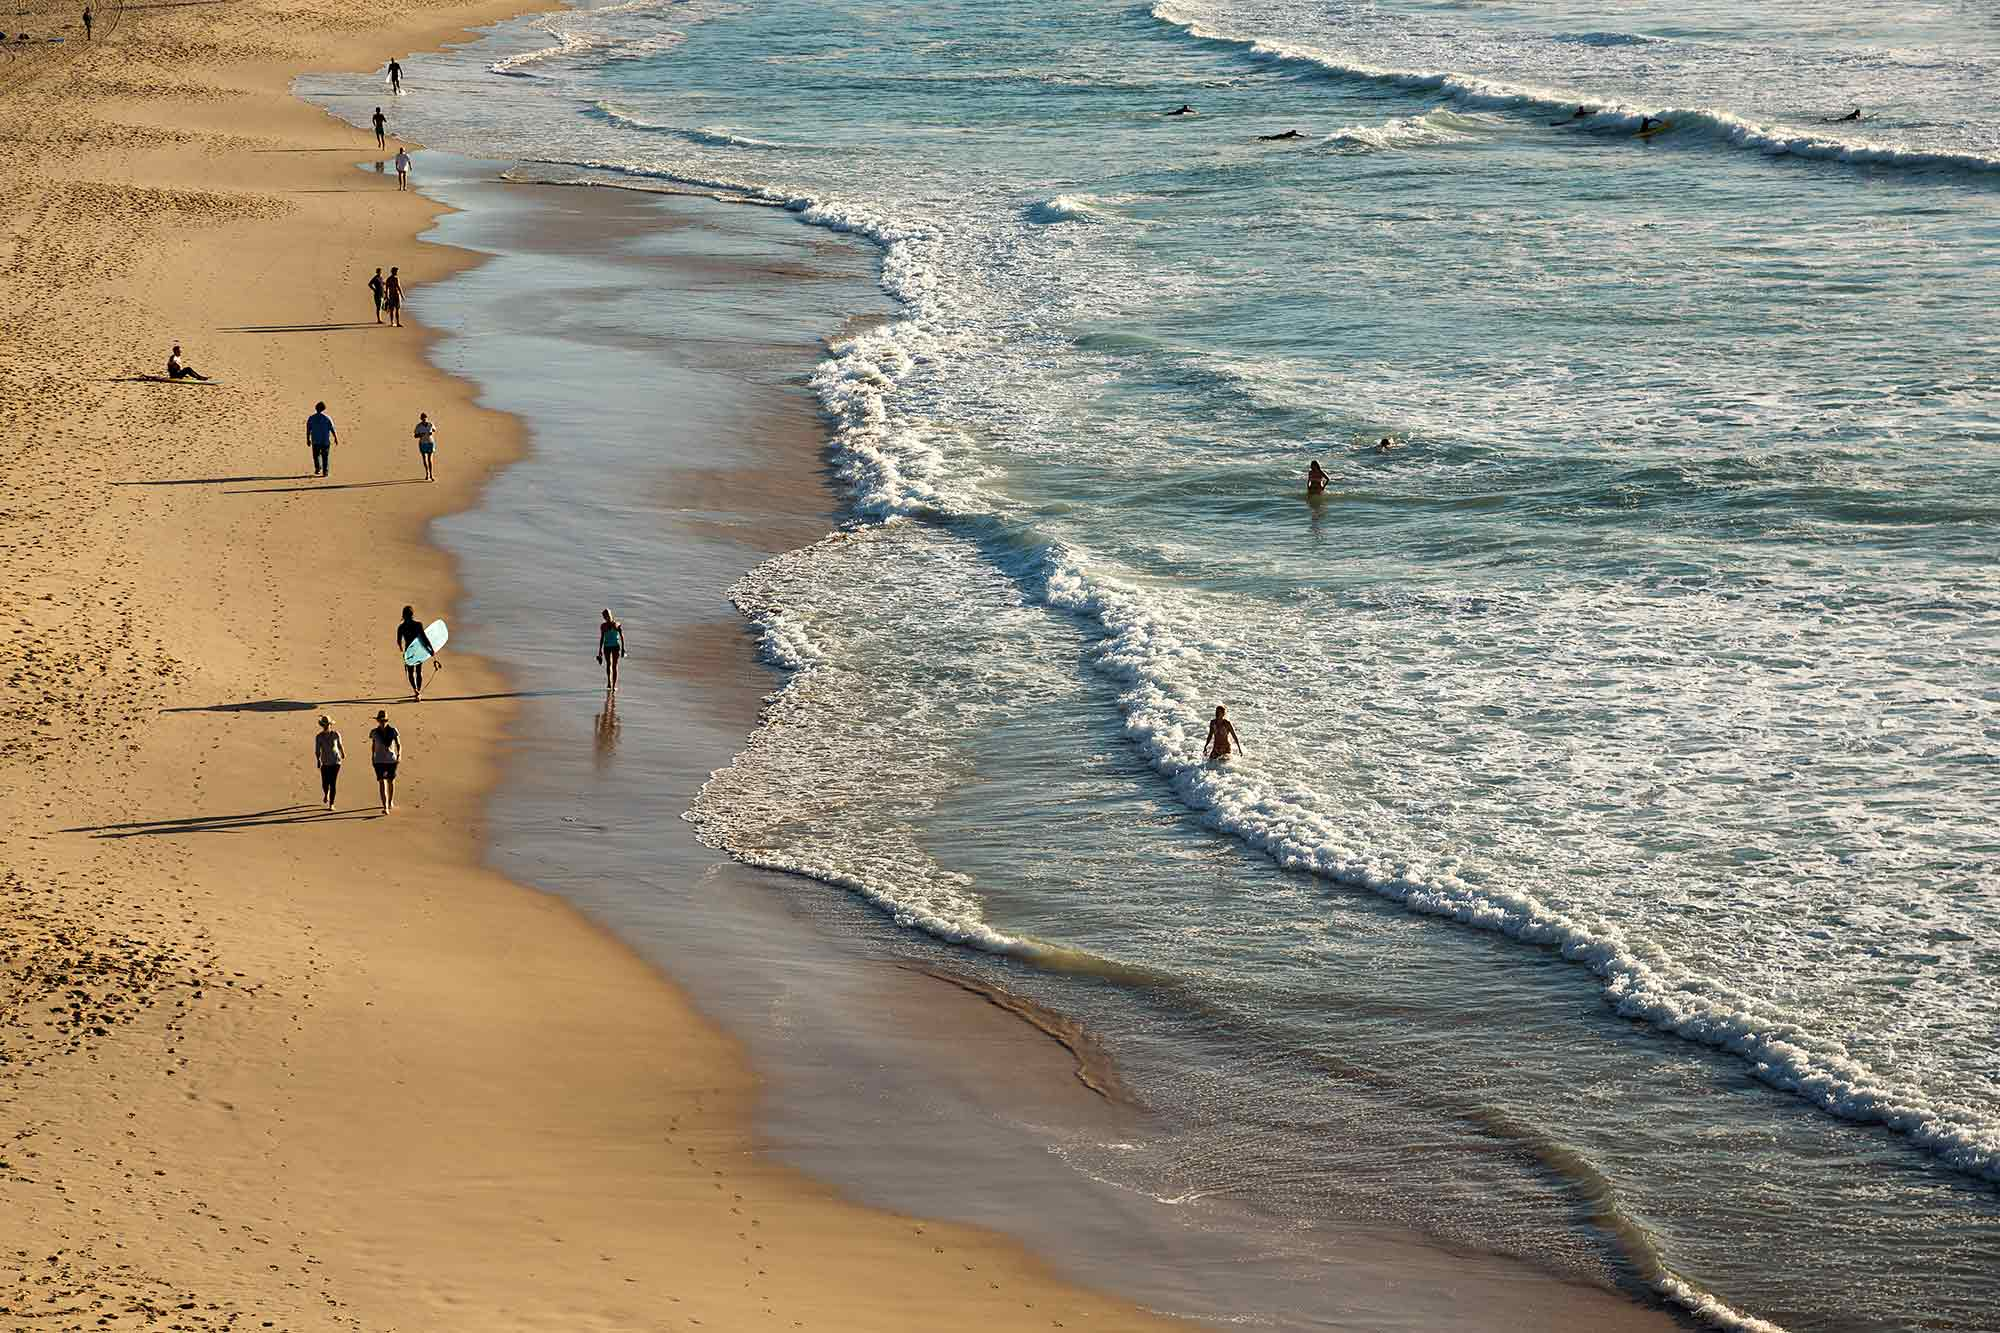 Sydney Coastal Walk: Bondi Beach. © Ulli Maier & Nisa Maier